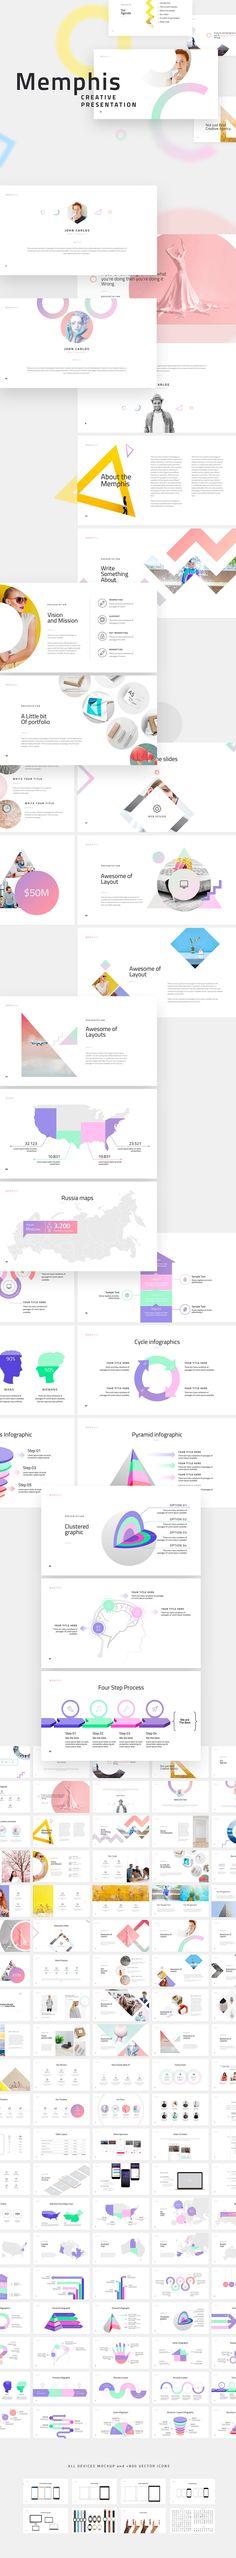 Memphis Powerpoint Template by Dublin_Design on @creativemarket